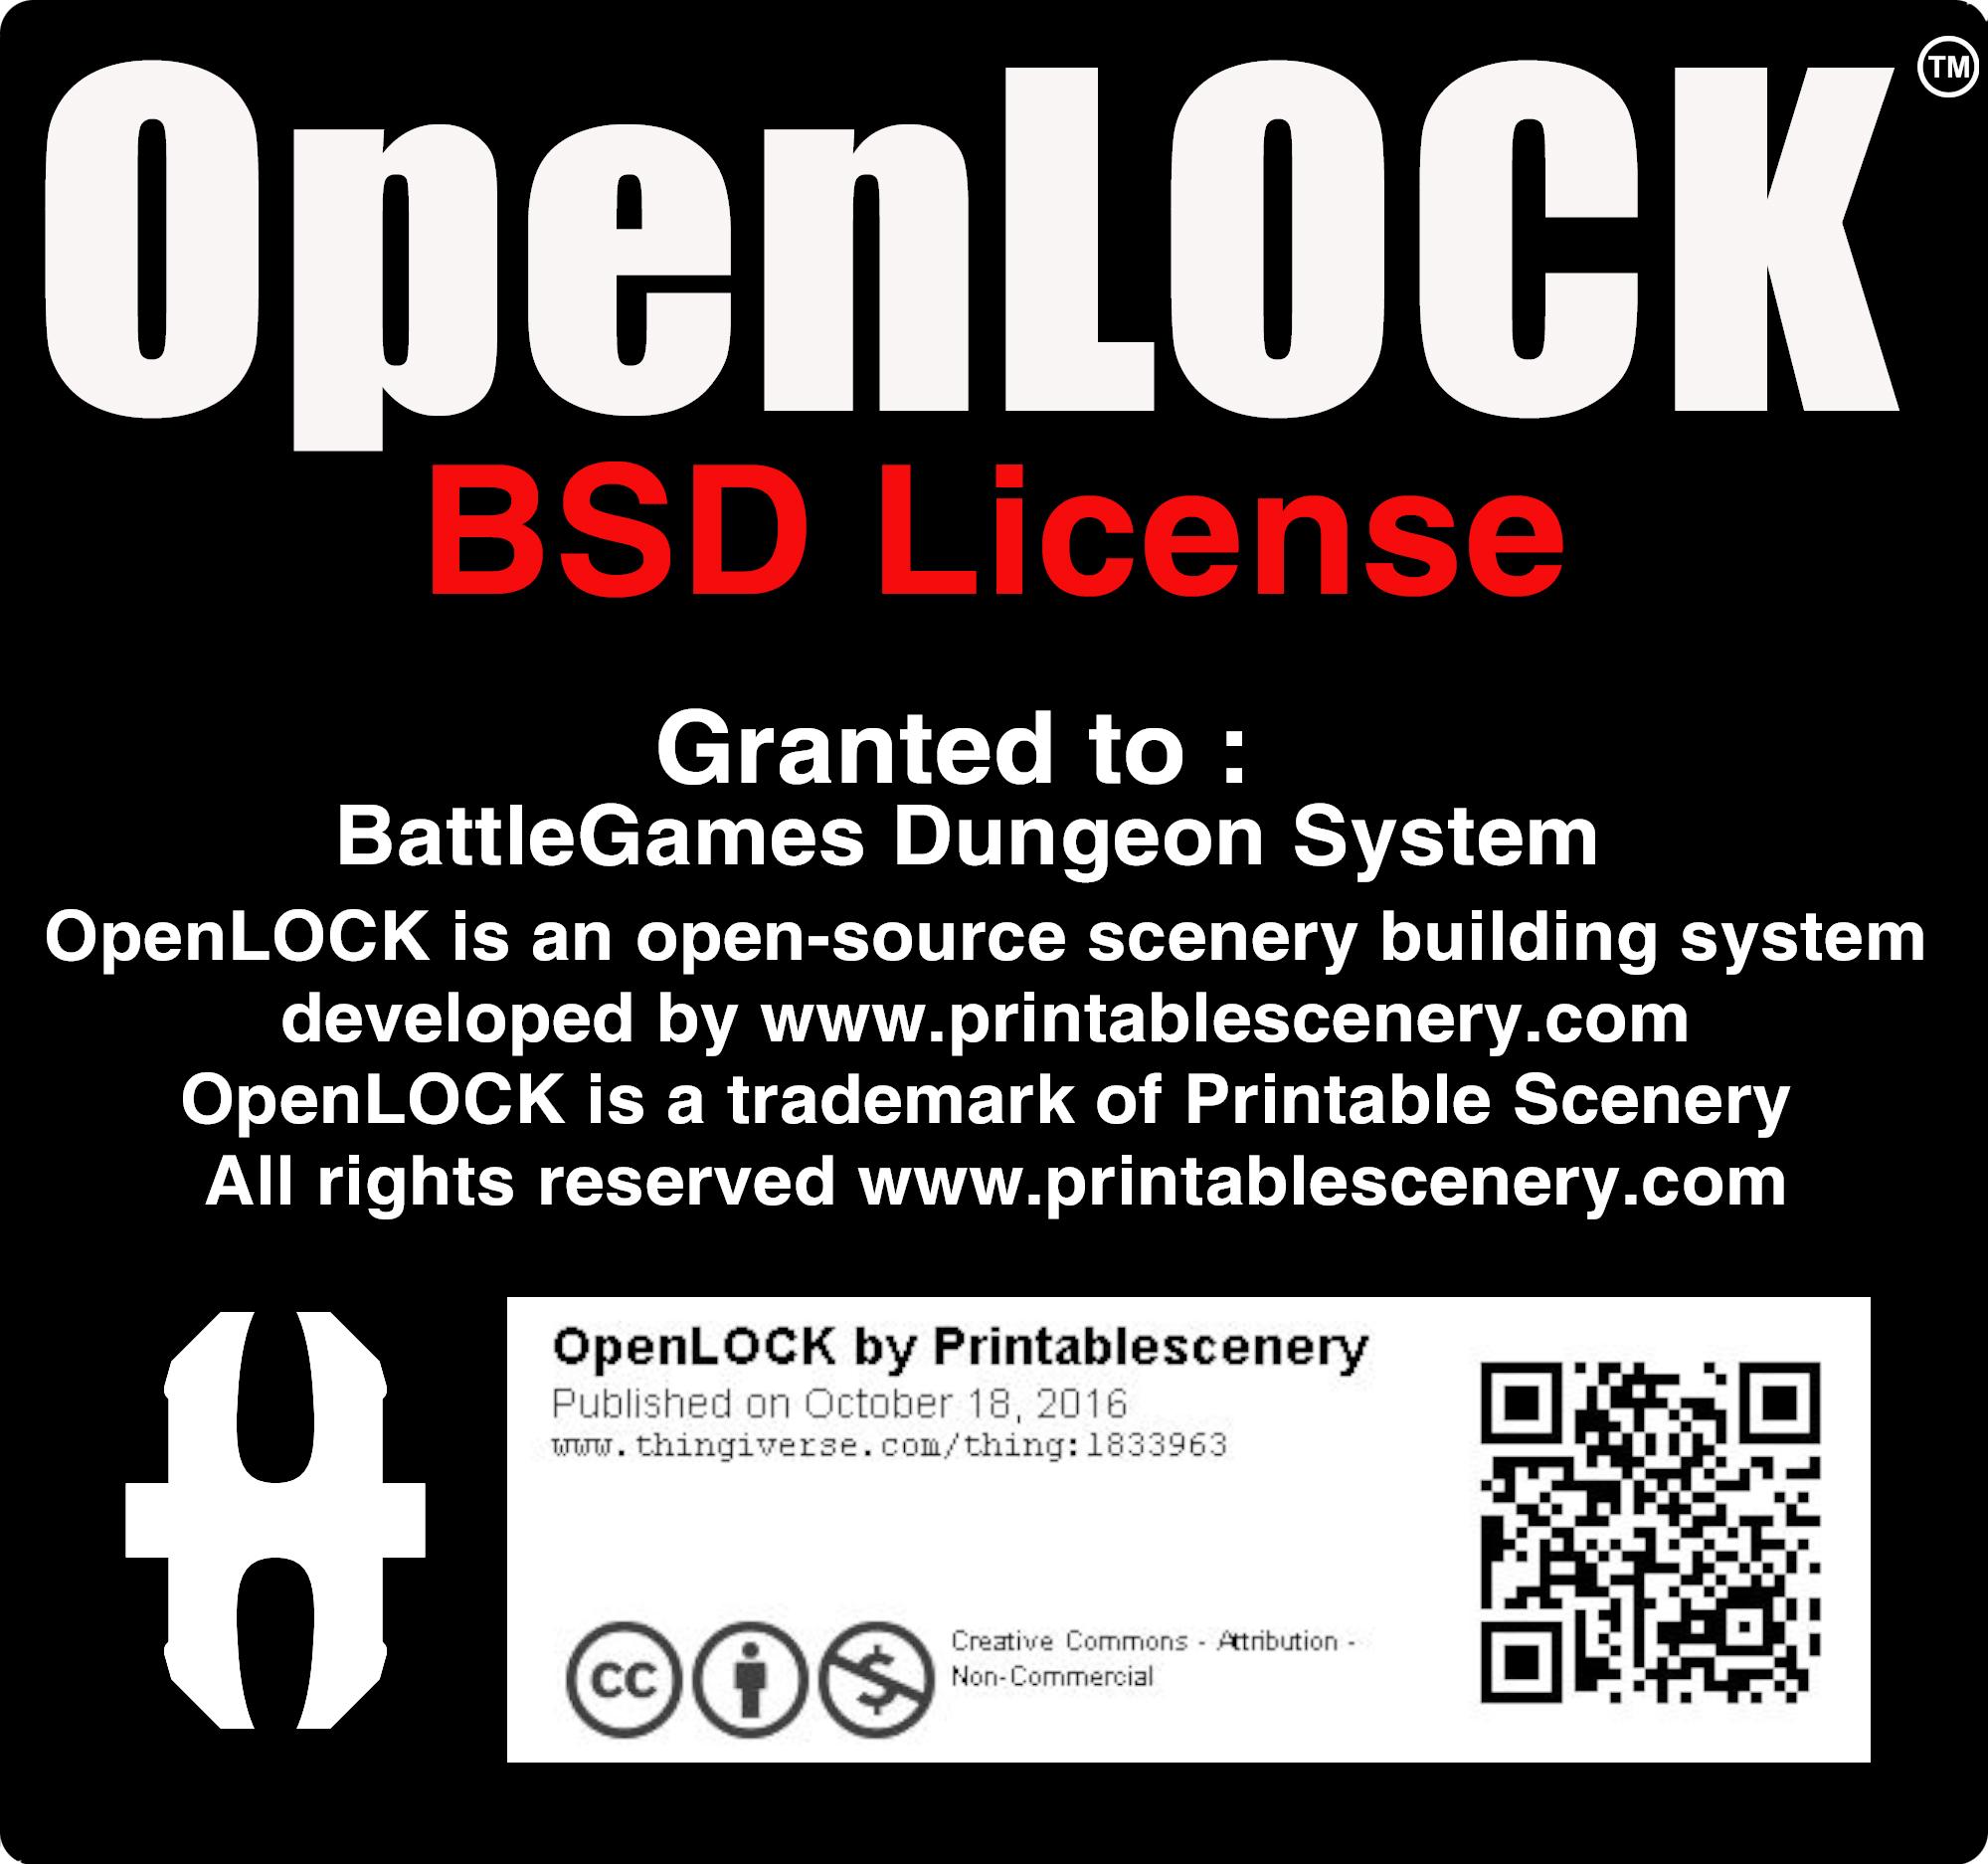 OpenLOCK system